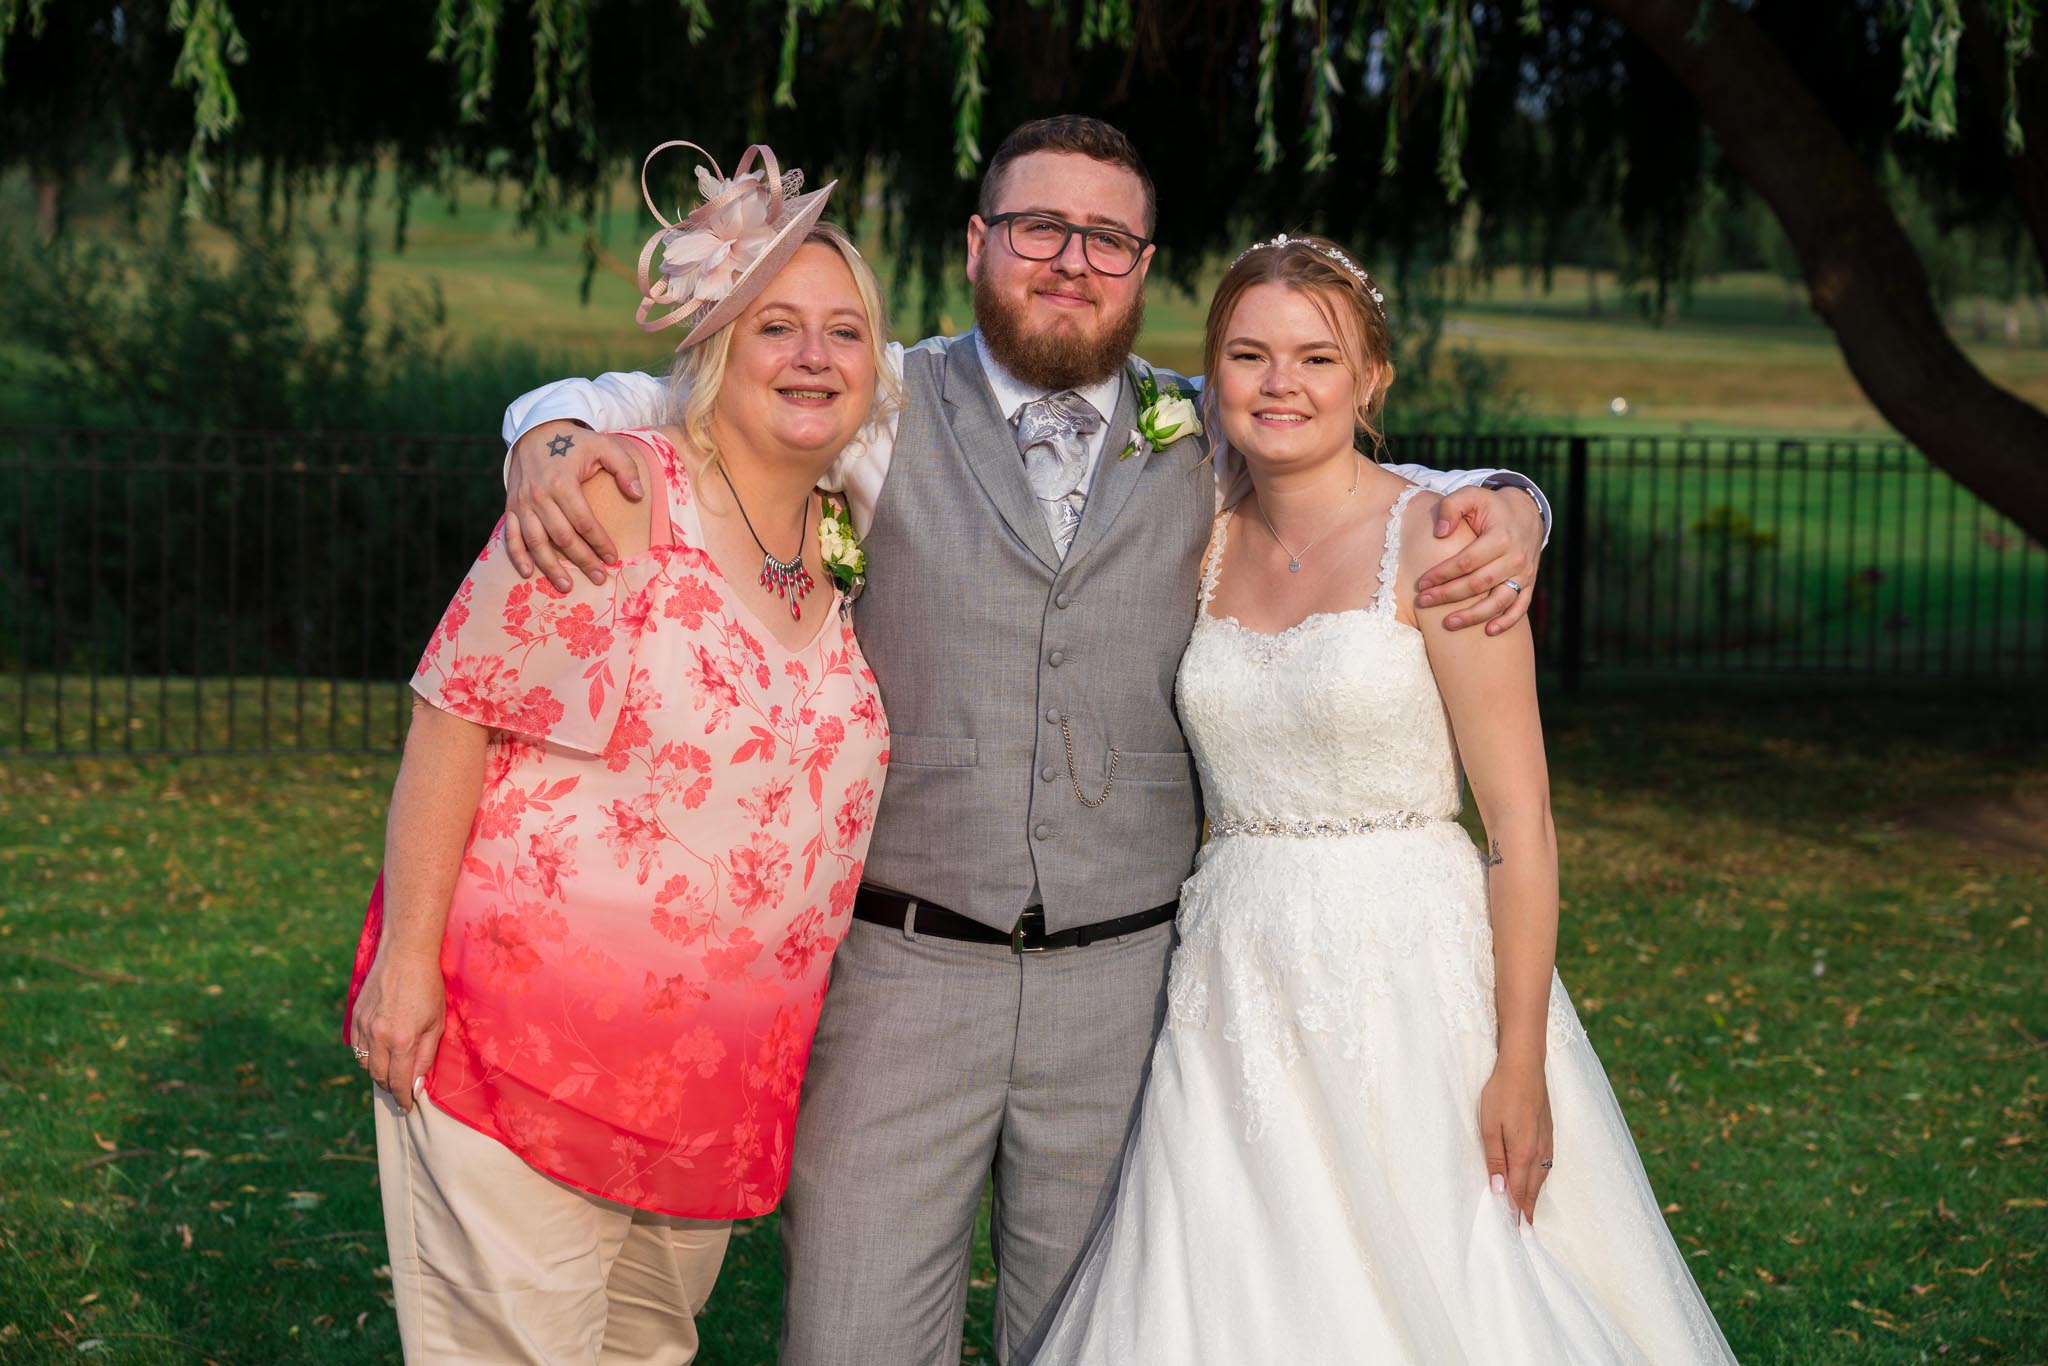 695-family-friends-Luke-Yasmin-The-Rayleigh-Club-Wedding-Photography.jpg